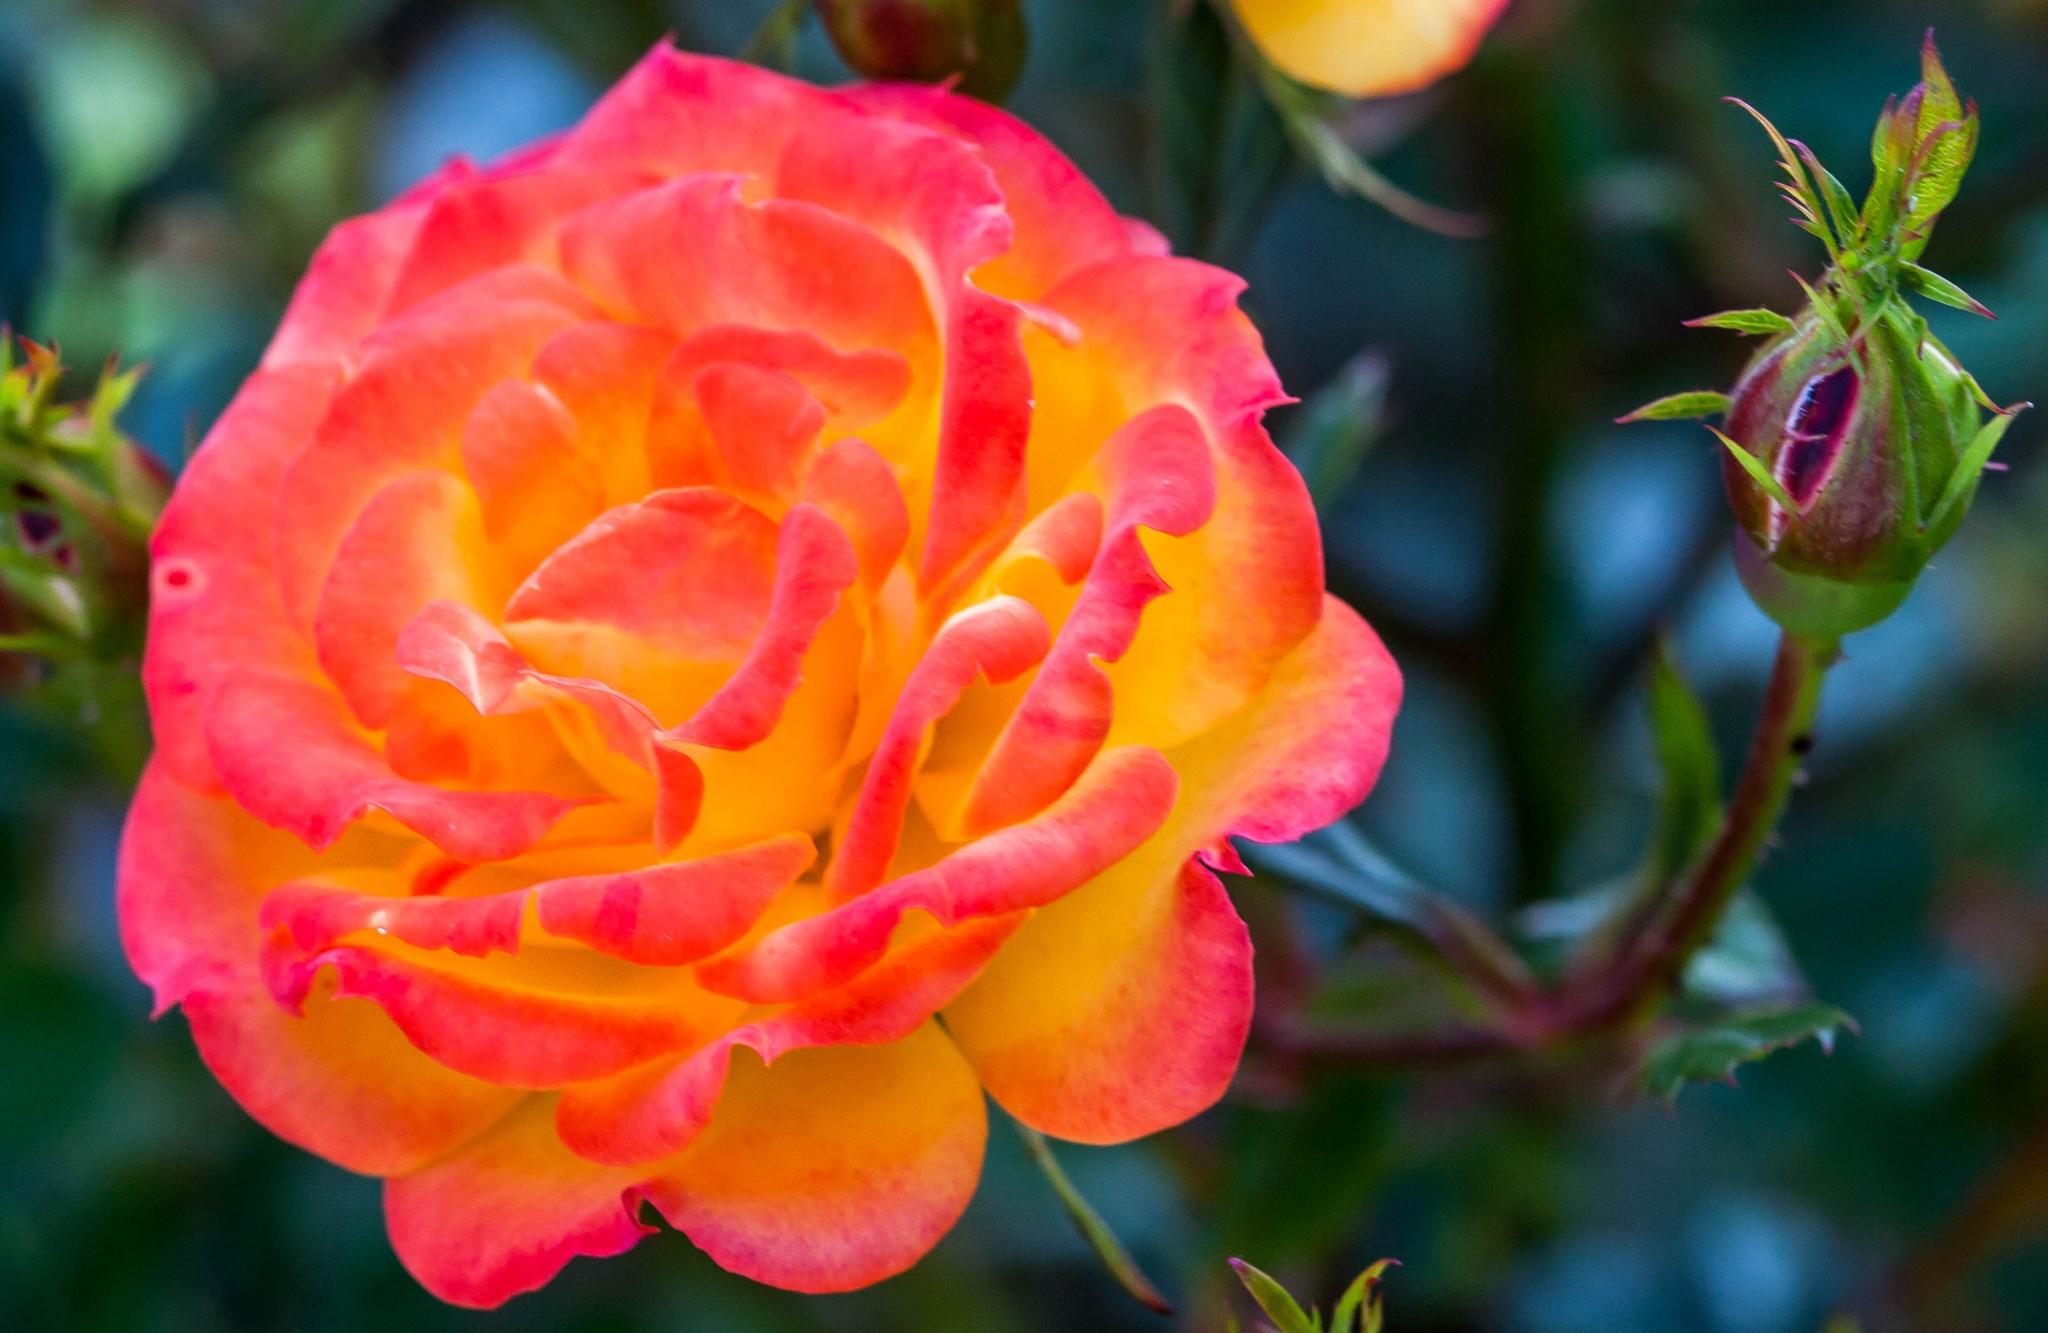 Beautiful Rose by bob.cunningham.56884